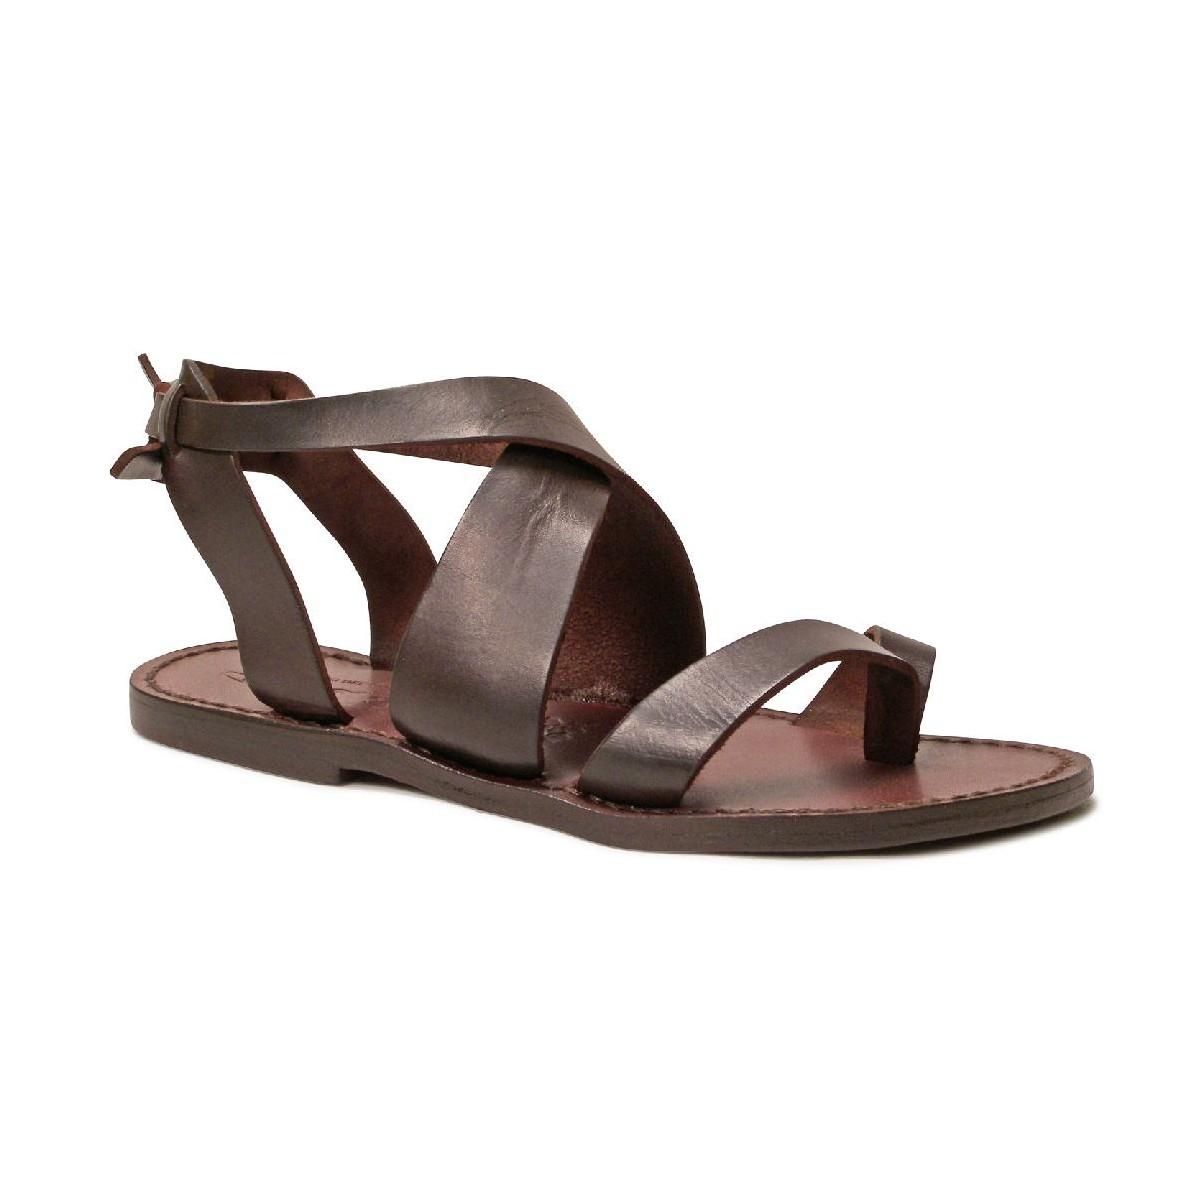 damen sandalen aus dunkelbraunem leder in italien von. Black Bedroom Furniture Sets. Home Design Ideas